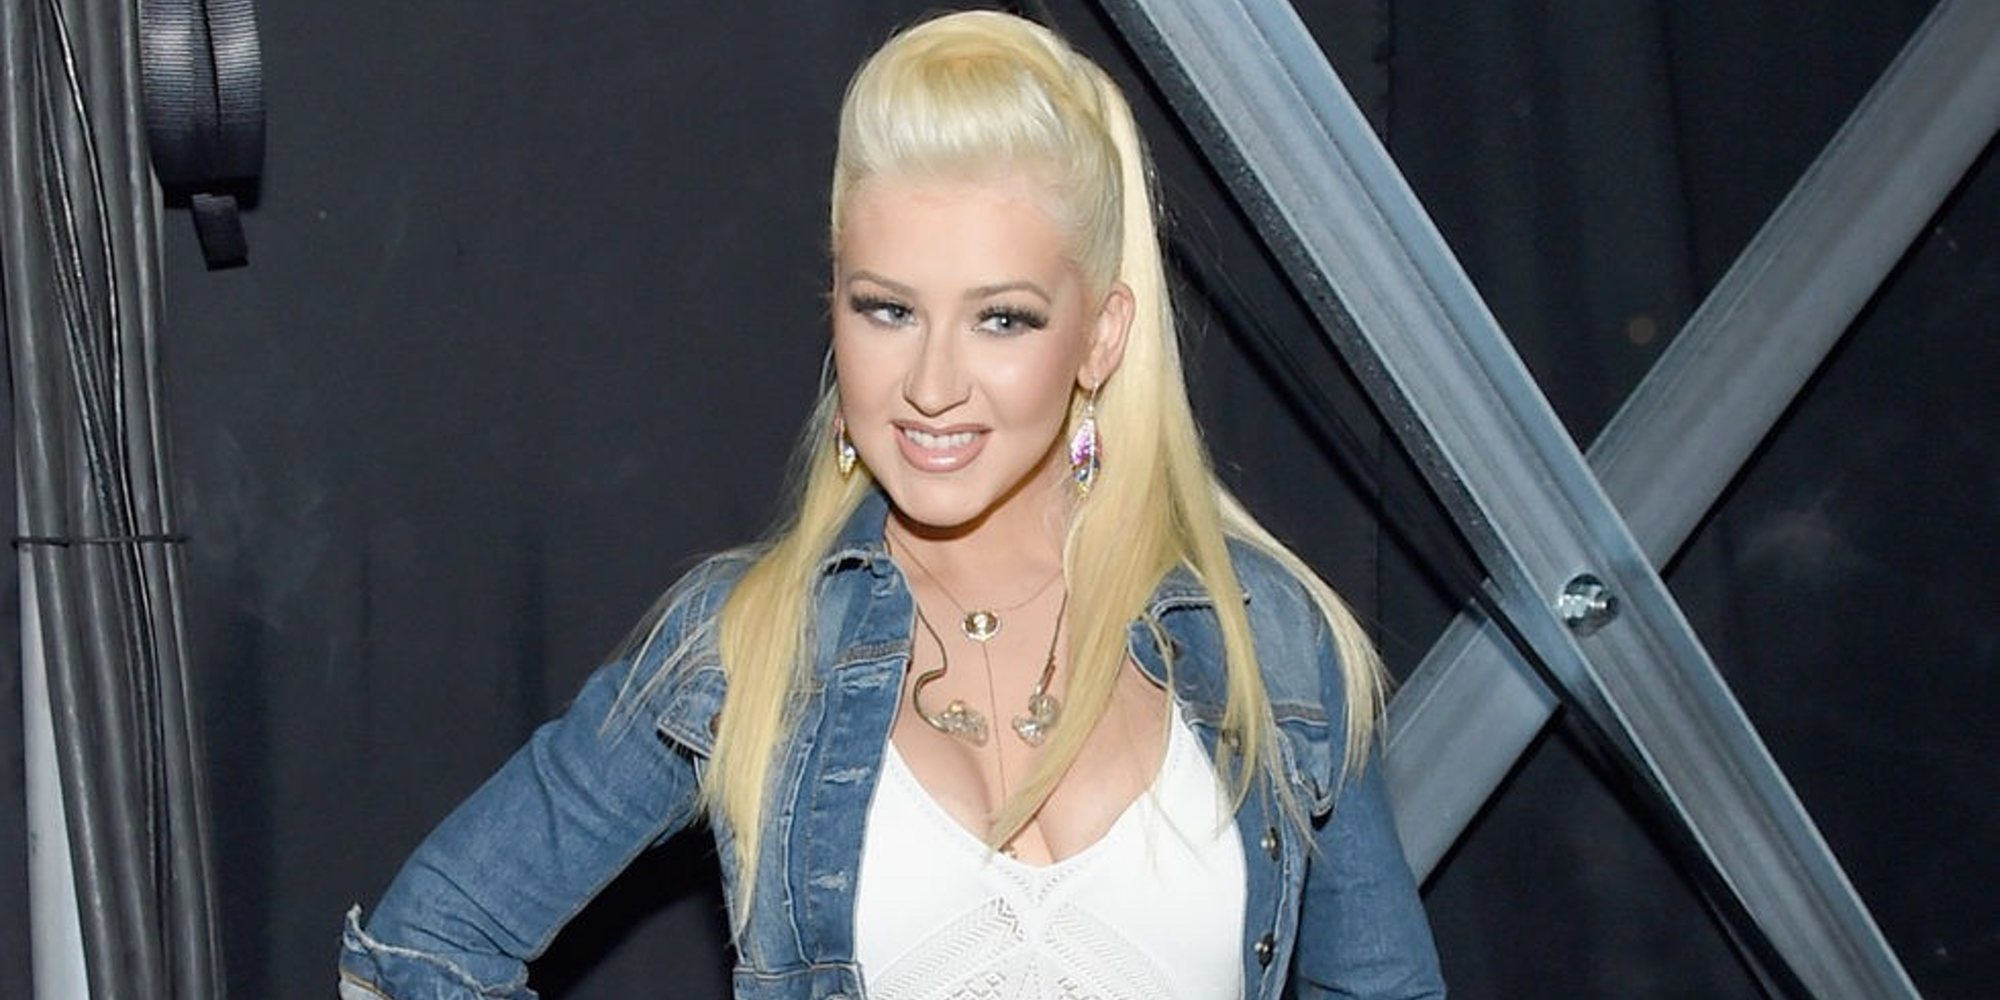 Christina Aguilera, impresionada por una actuación de 'Got Talent' España